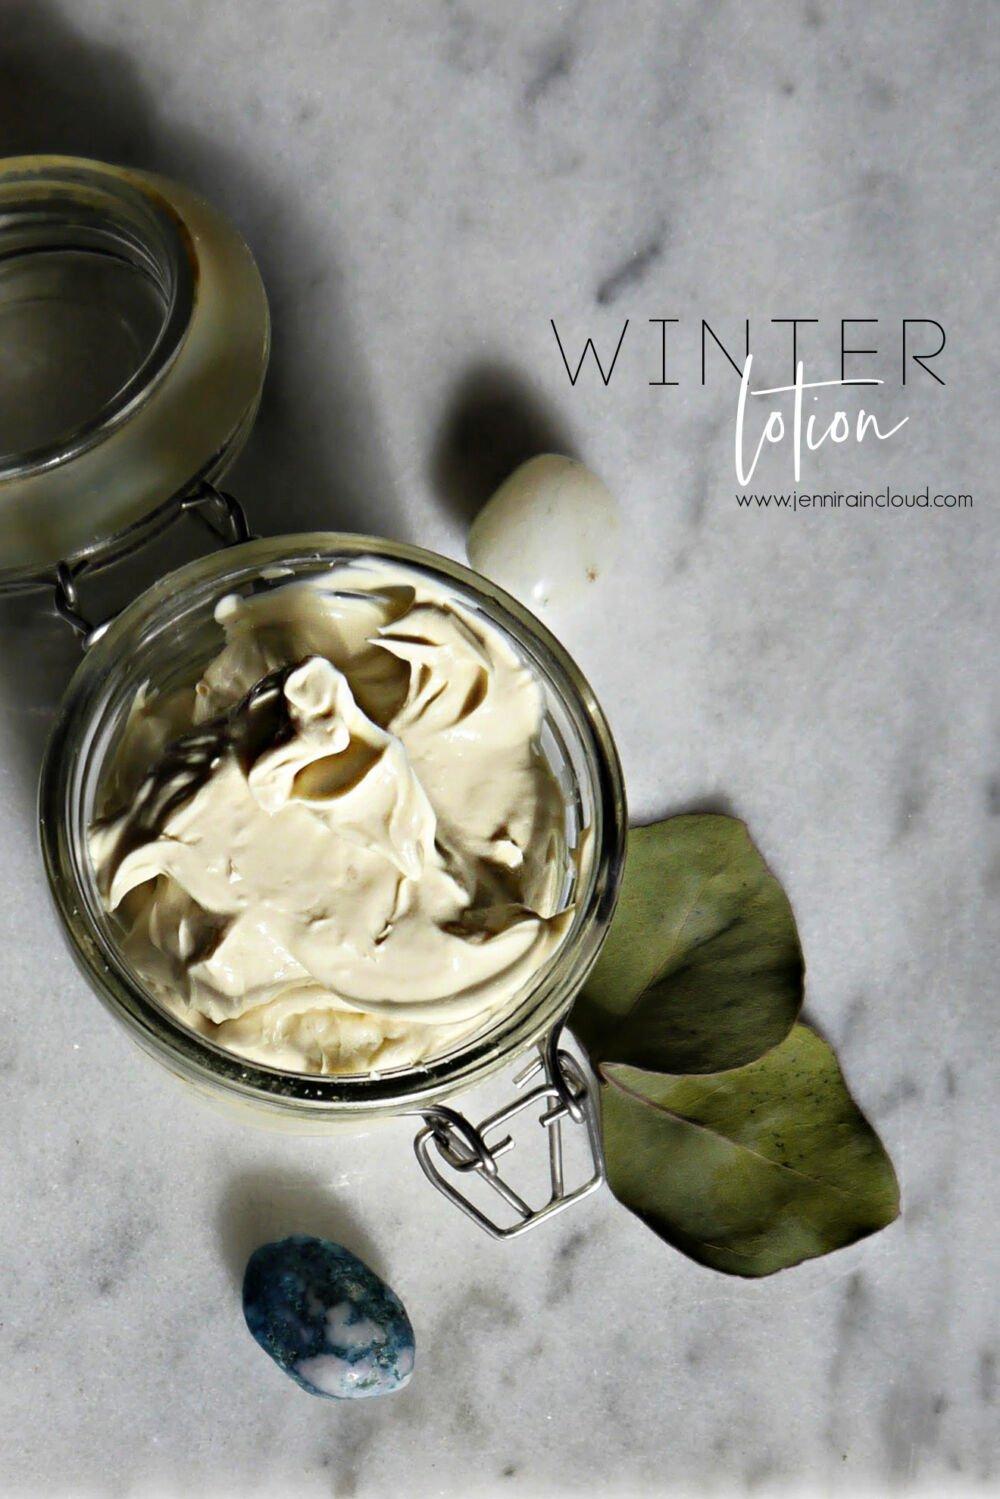 DIY Winter Lotion